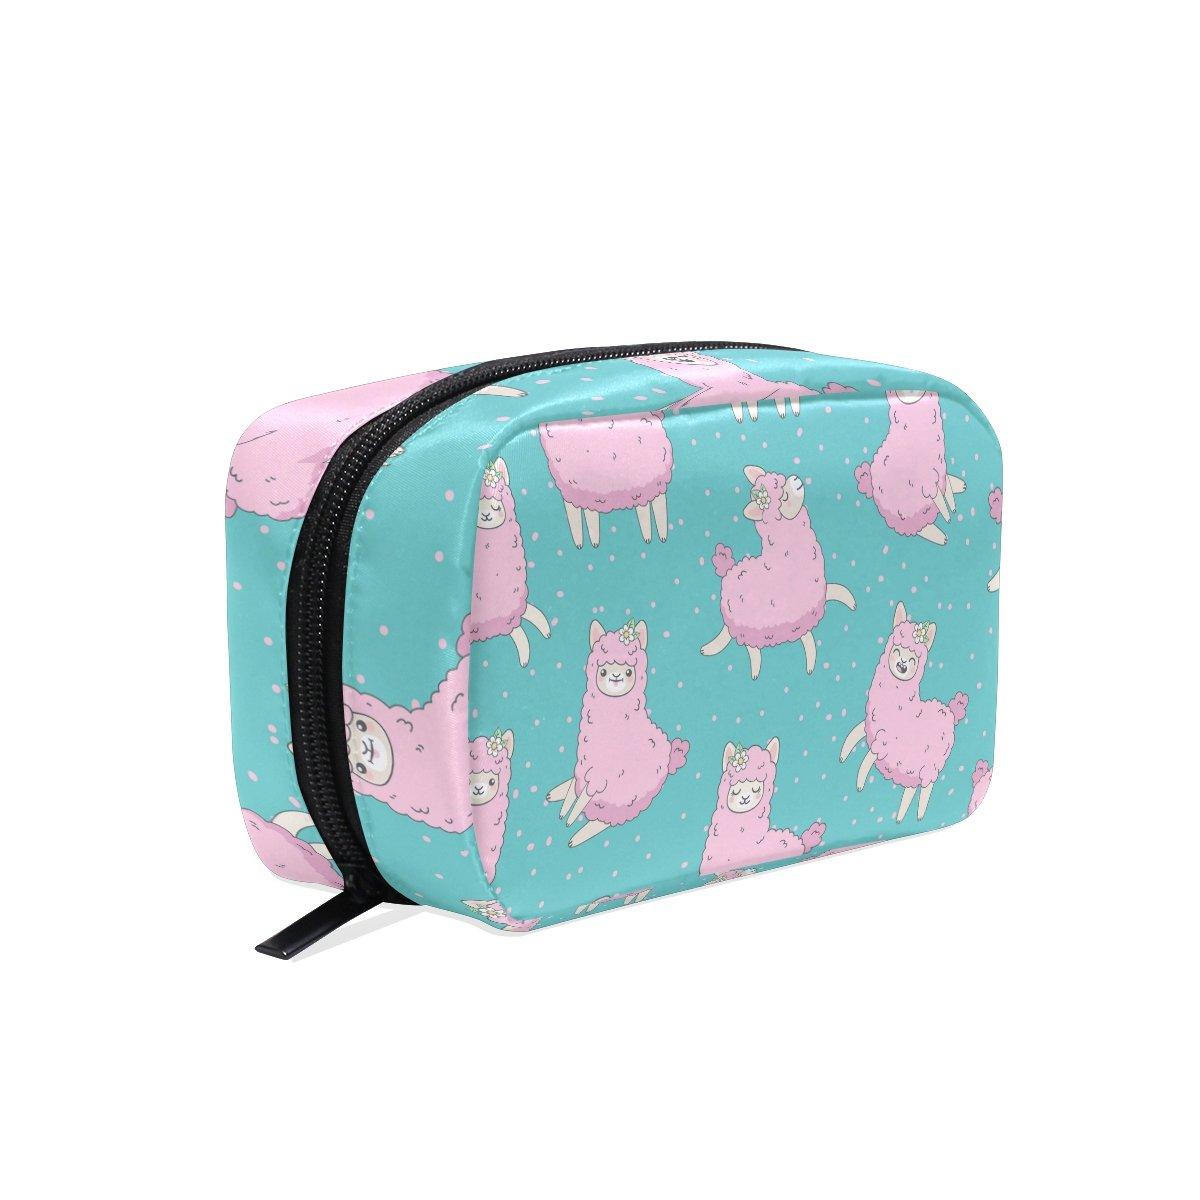 YZGO Cute Pink Fluffy Llama Alpaca Cosmetic Pouch Waterproof Makeup Bag Organizer Travel Case